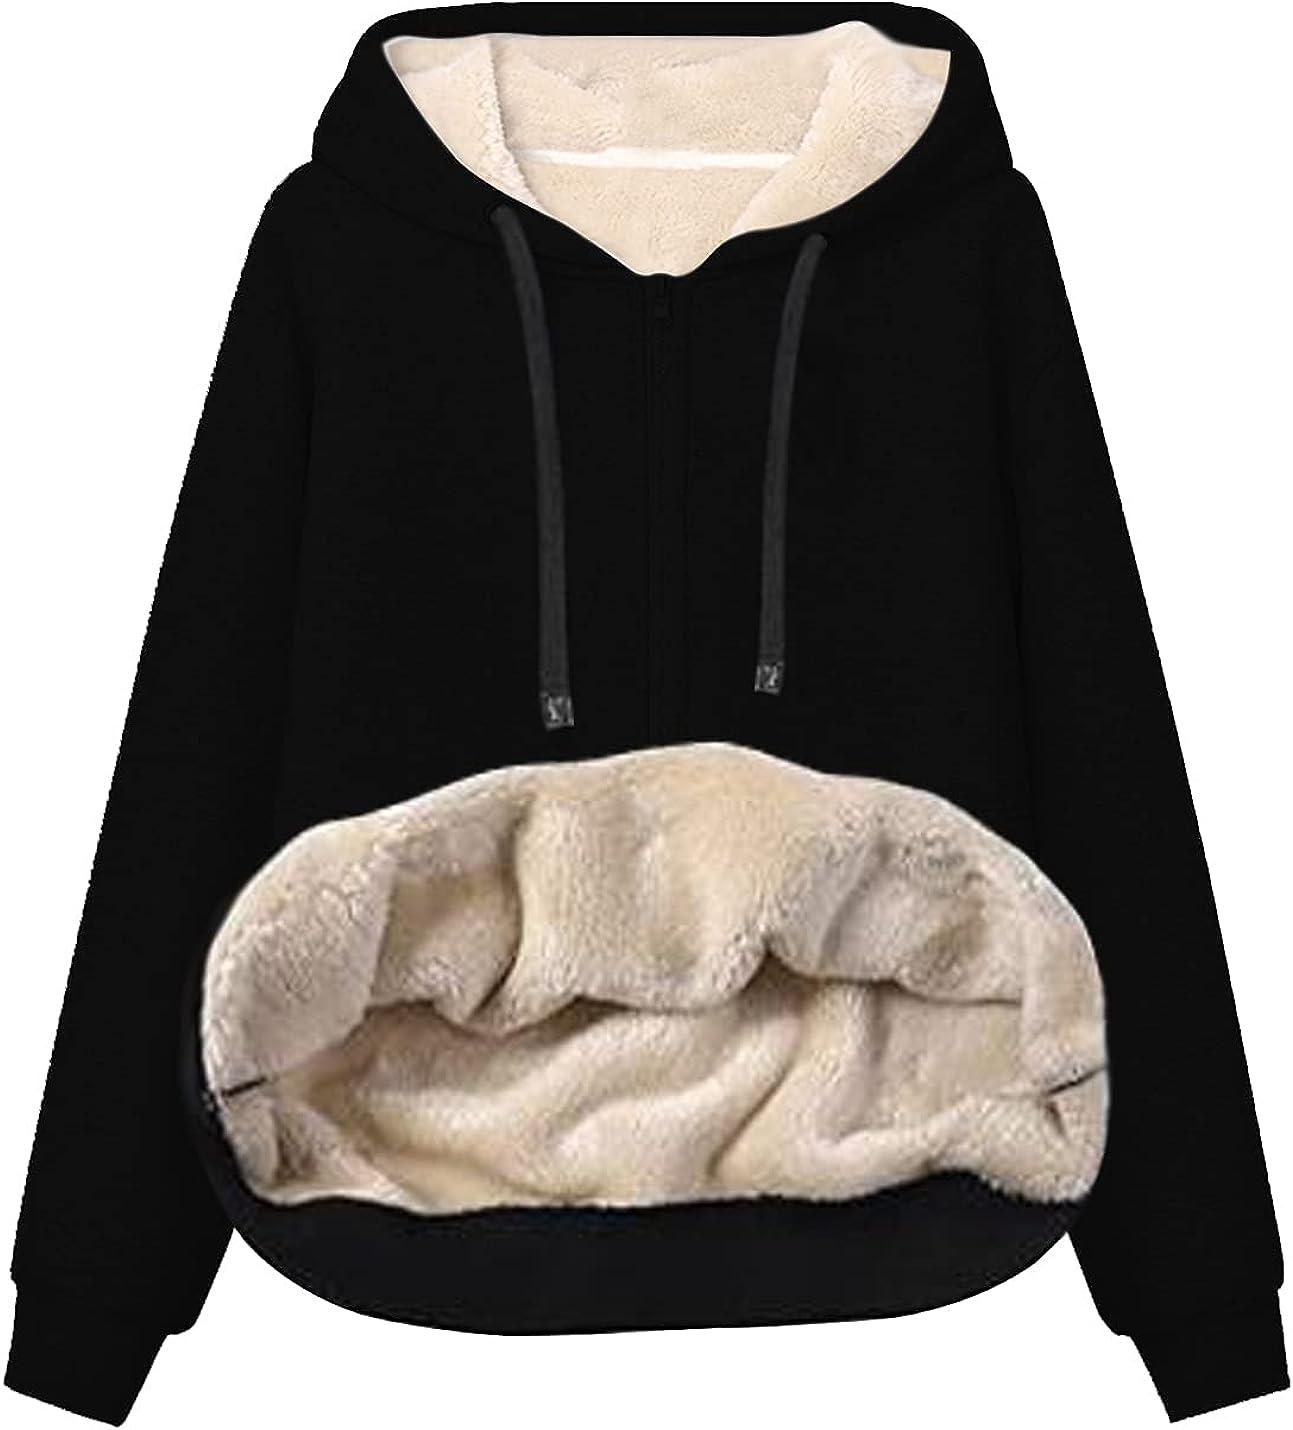 Xishiloft Womens Winter Warm Fleece Sherpa Lined Hoodies Casual Zip Up Hoodie Tops